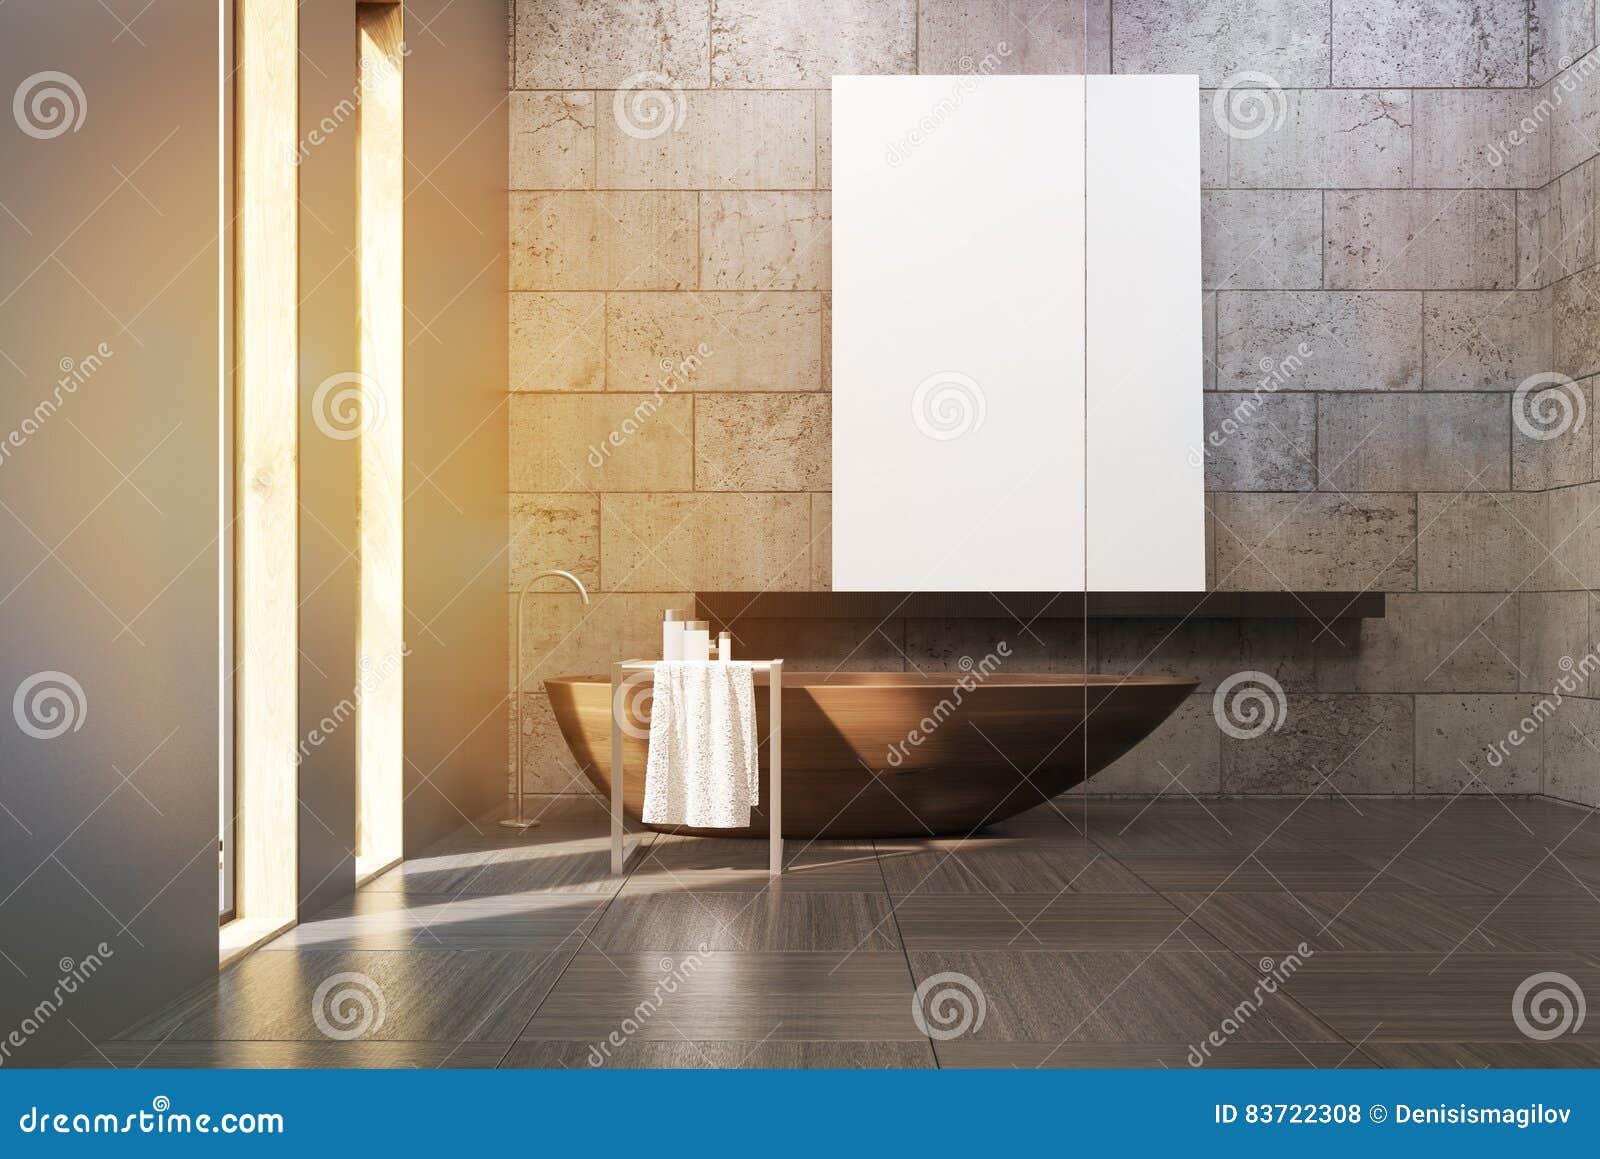 Badrummet med trä badar och affischen